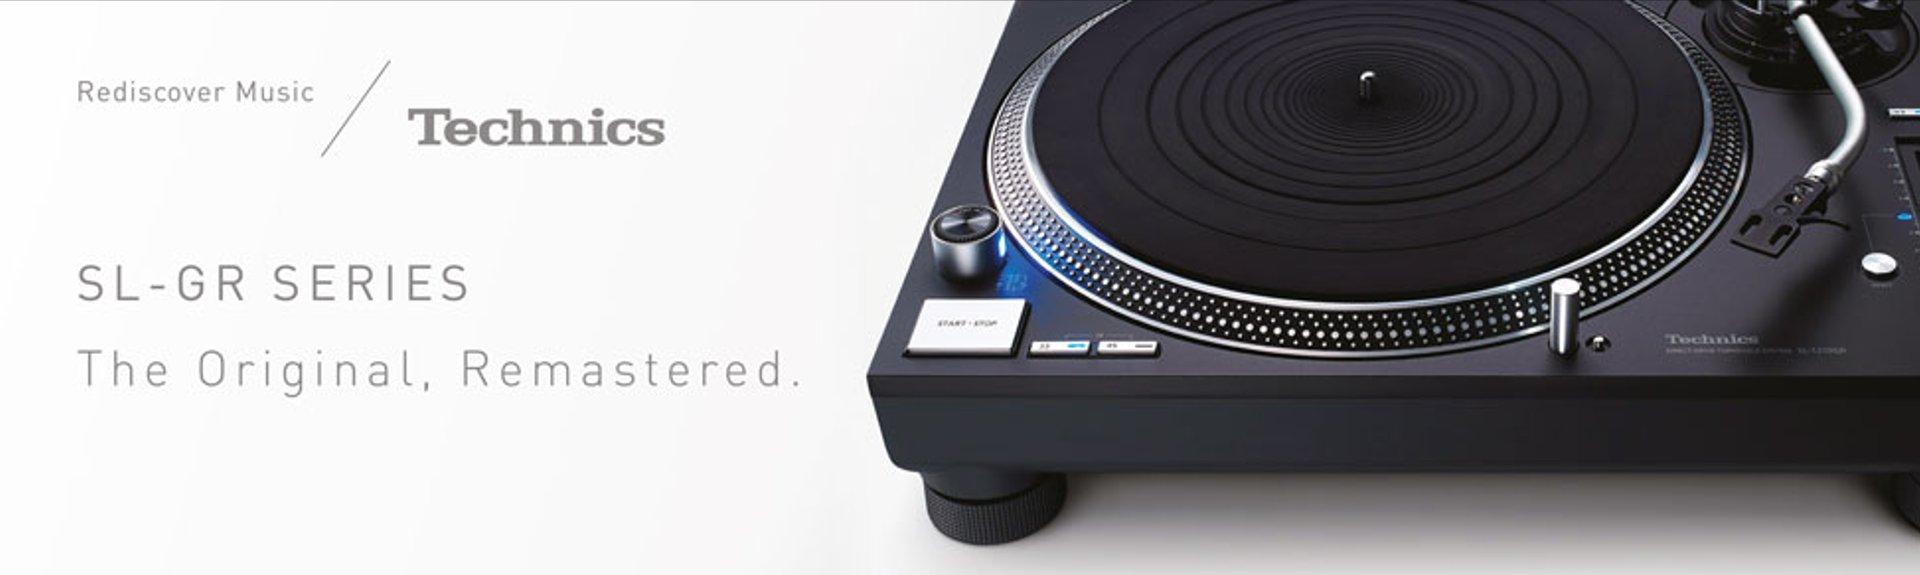 Technics SL1200/1210